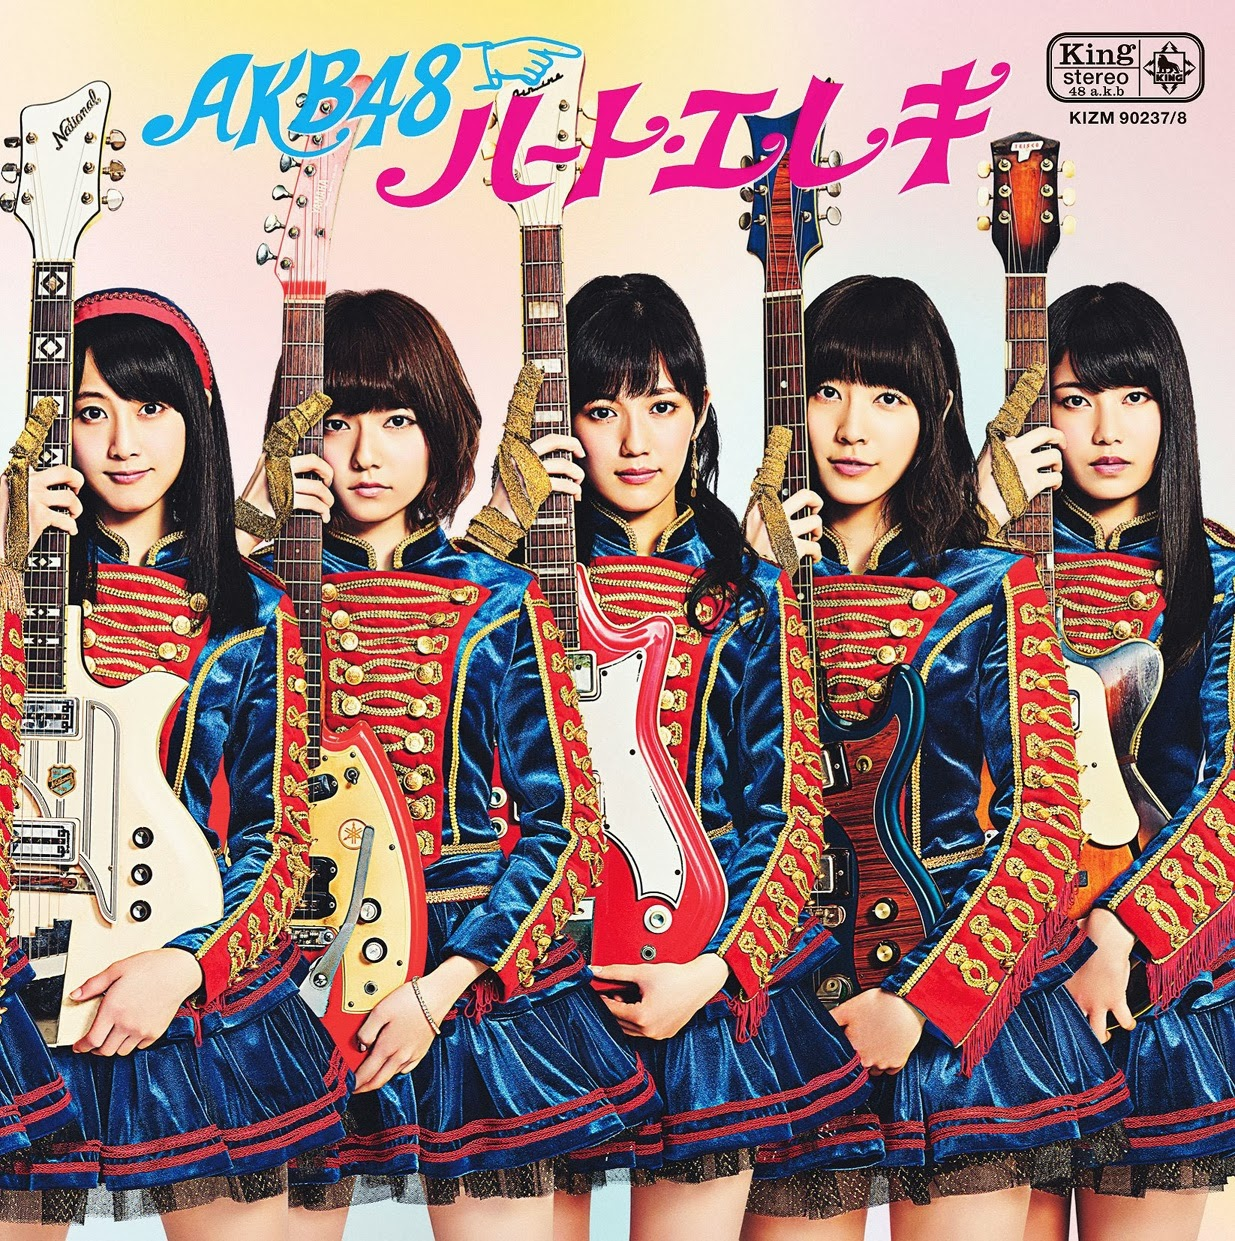 Mv Kiss And Makeup: AKB48 ハート・エレキ Heart Electric ジャケット Cover + 収録曲 Tracklist